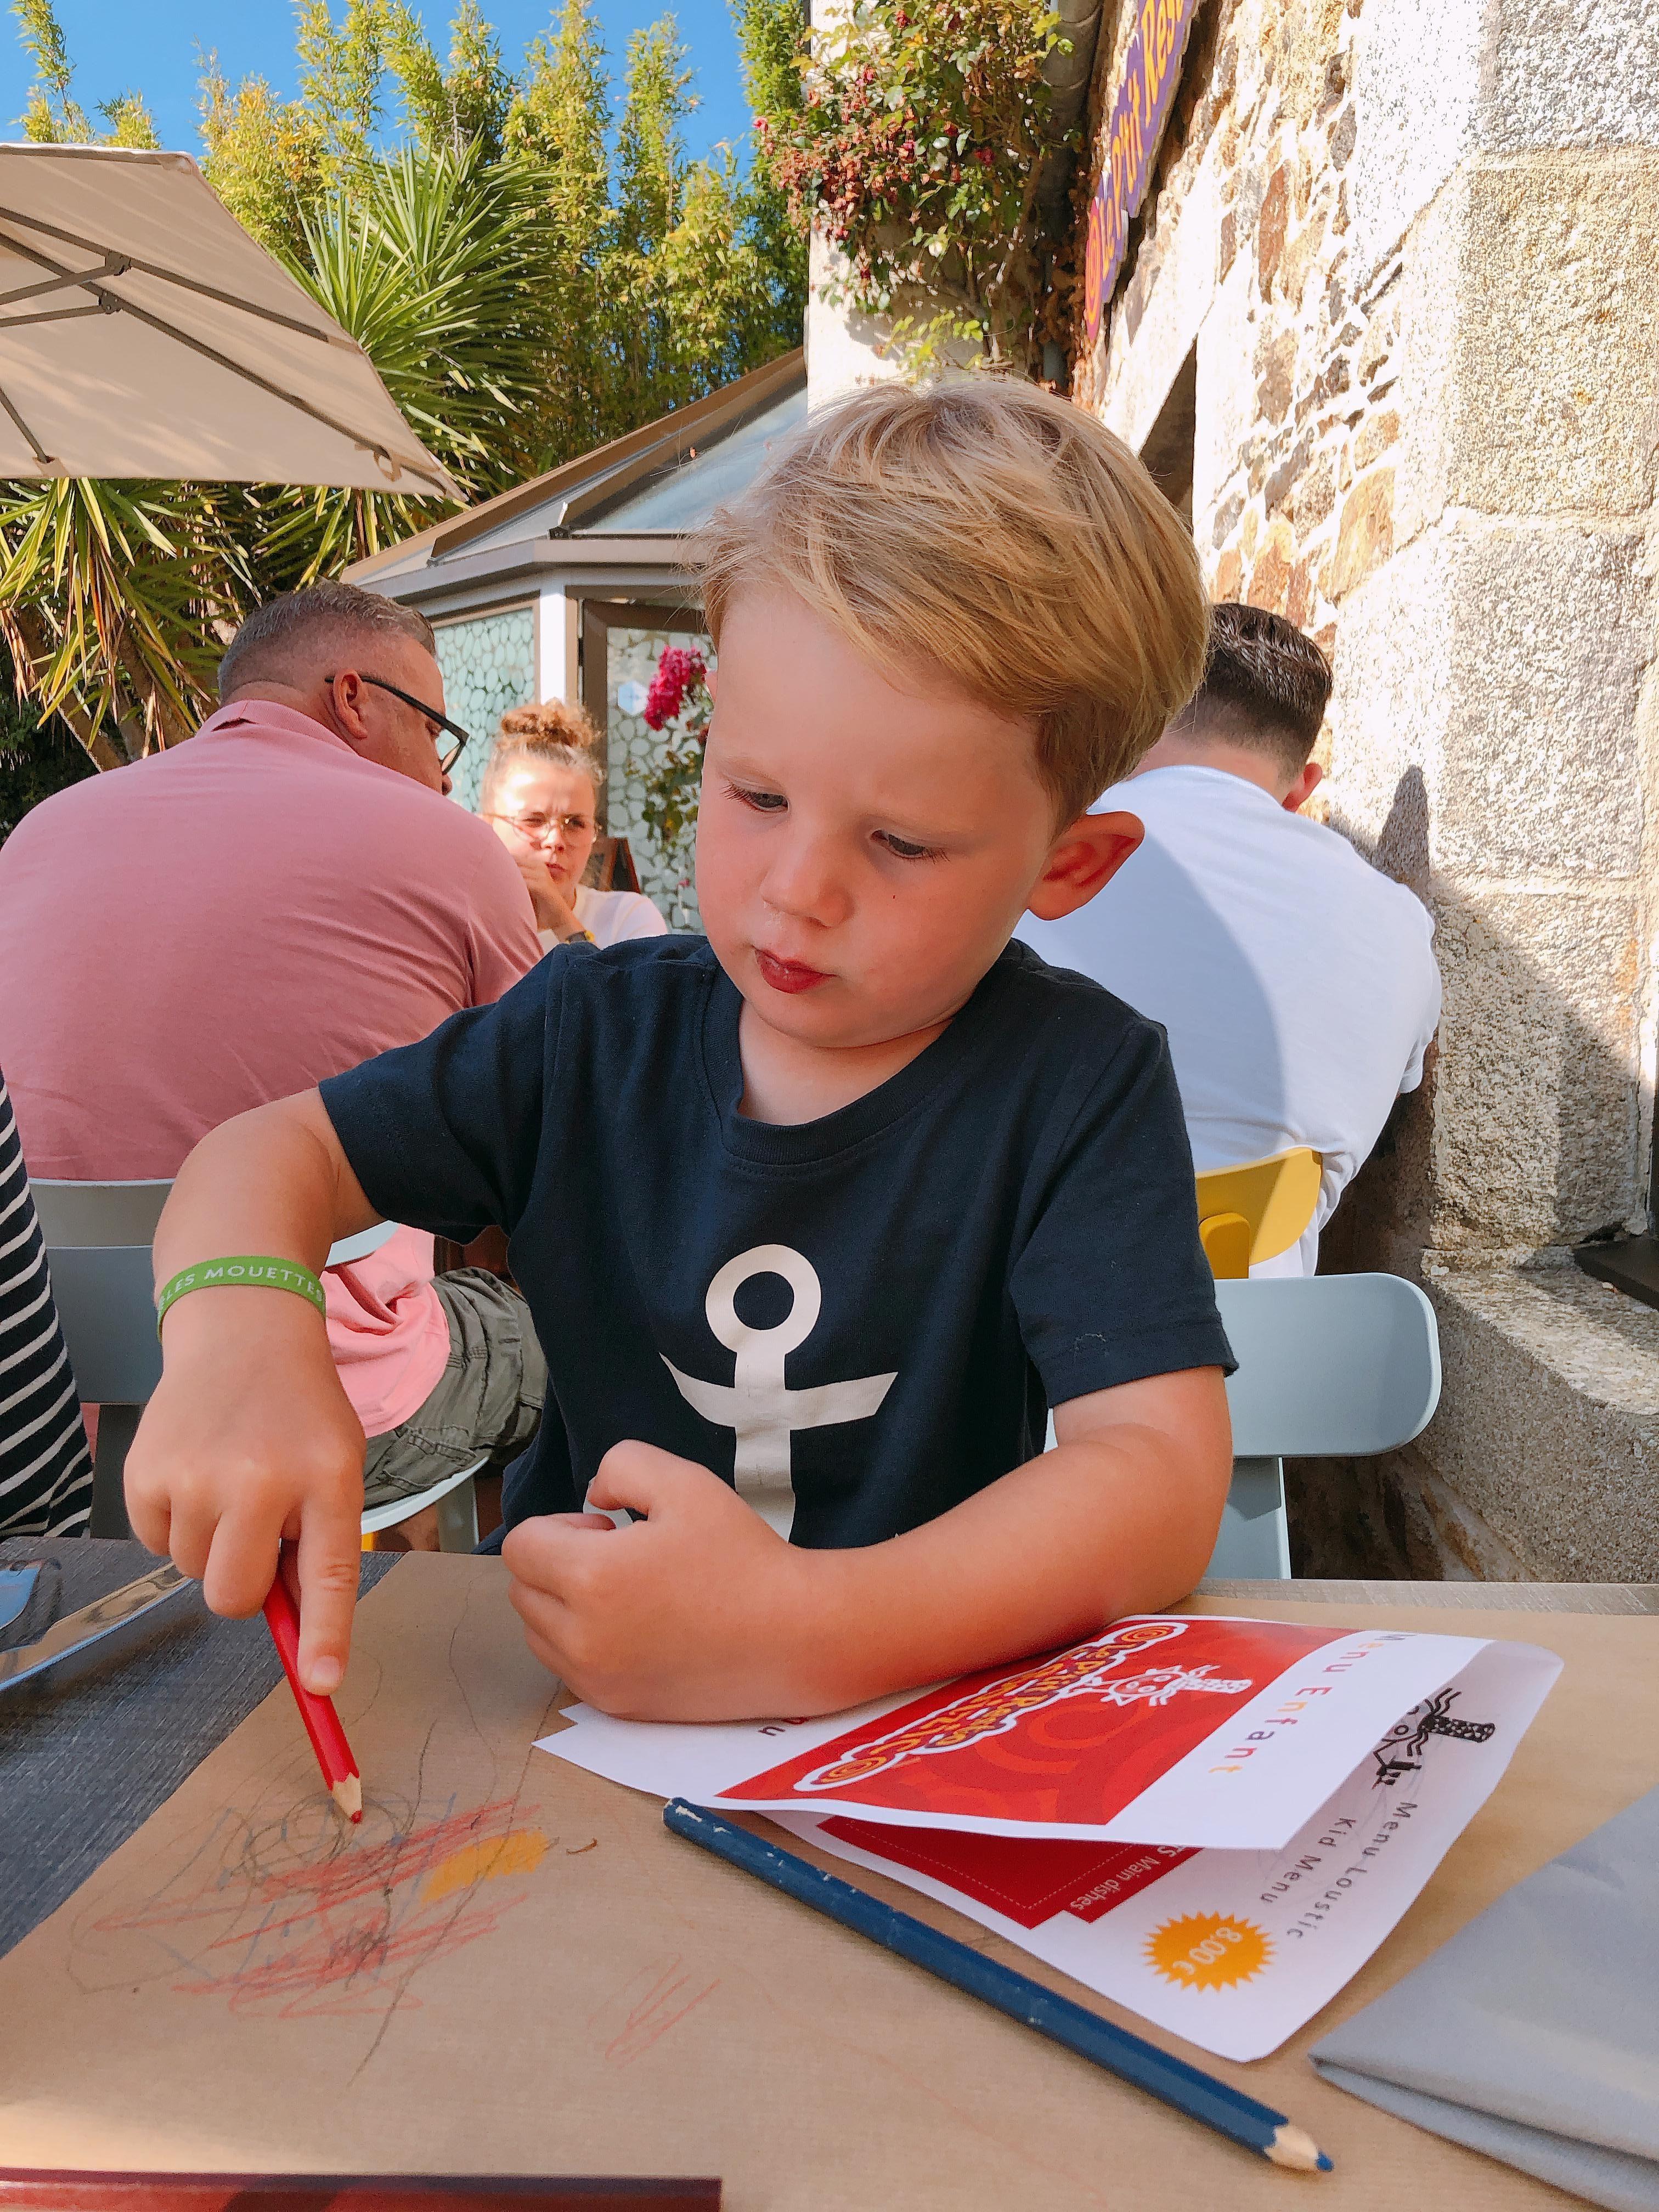 IMG 9988 4032x3024 e1563907038146 - Fotodagboek Vakantie: Camping Les Mouettes, Bretagne!